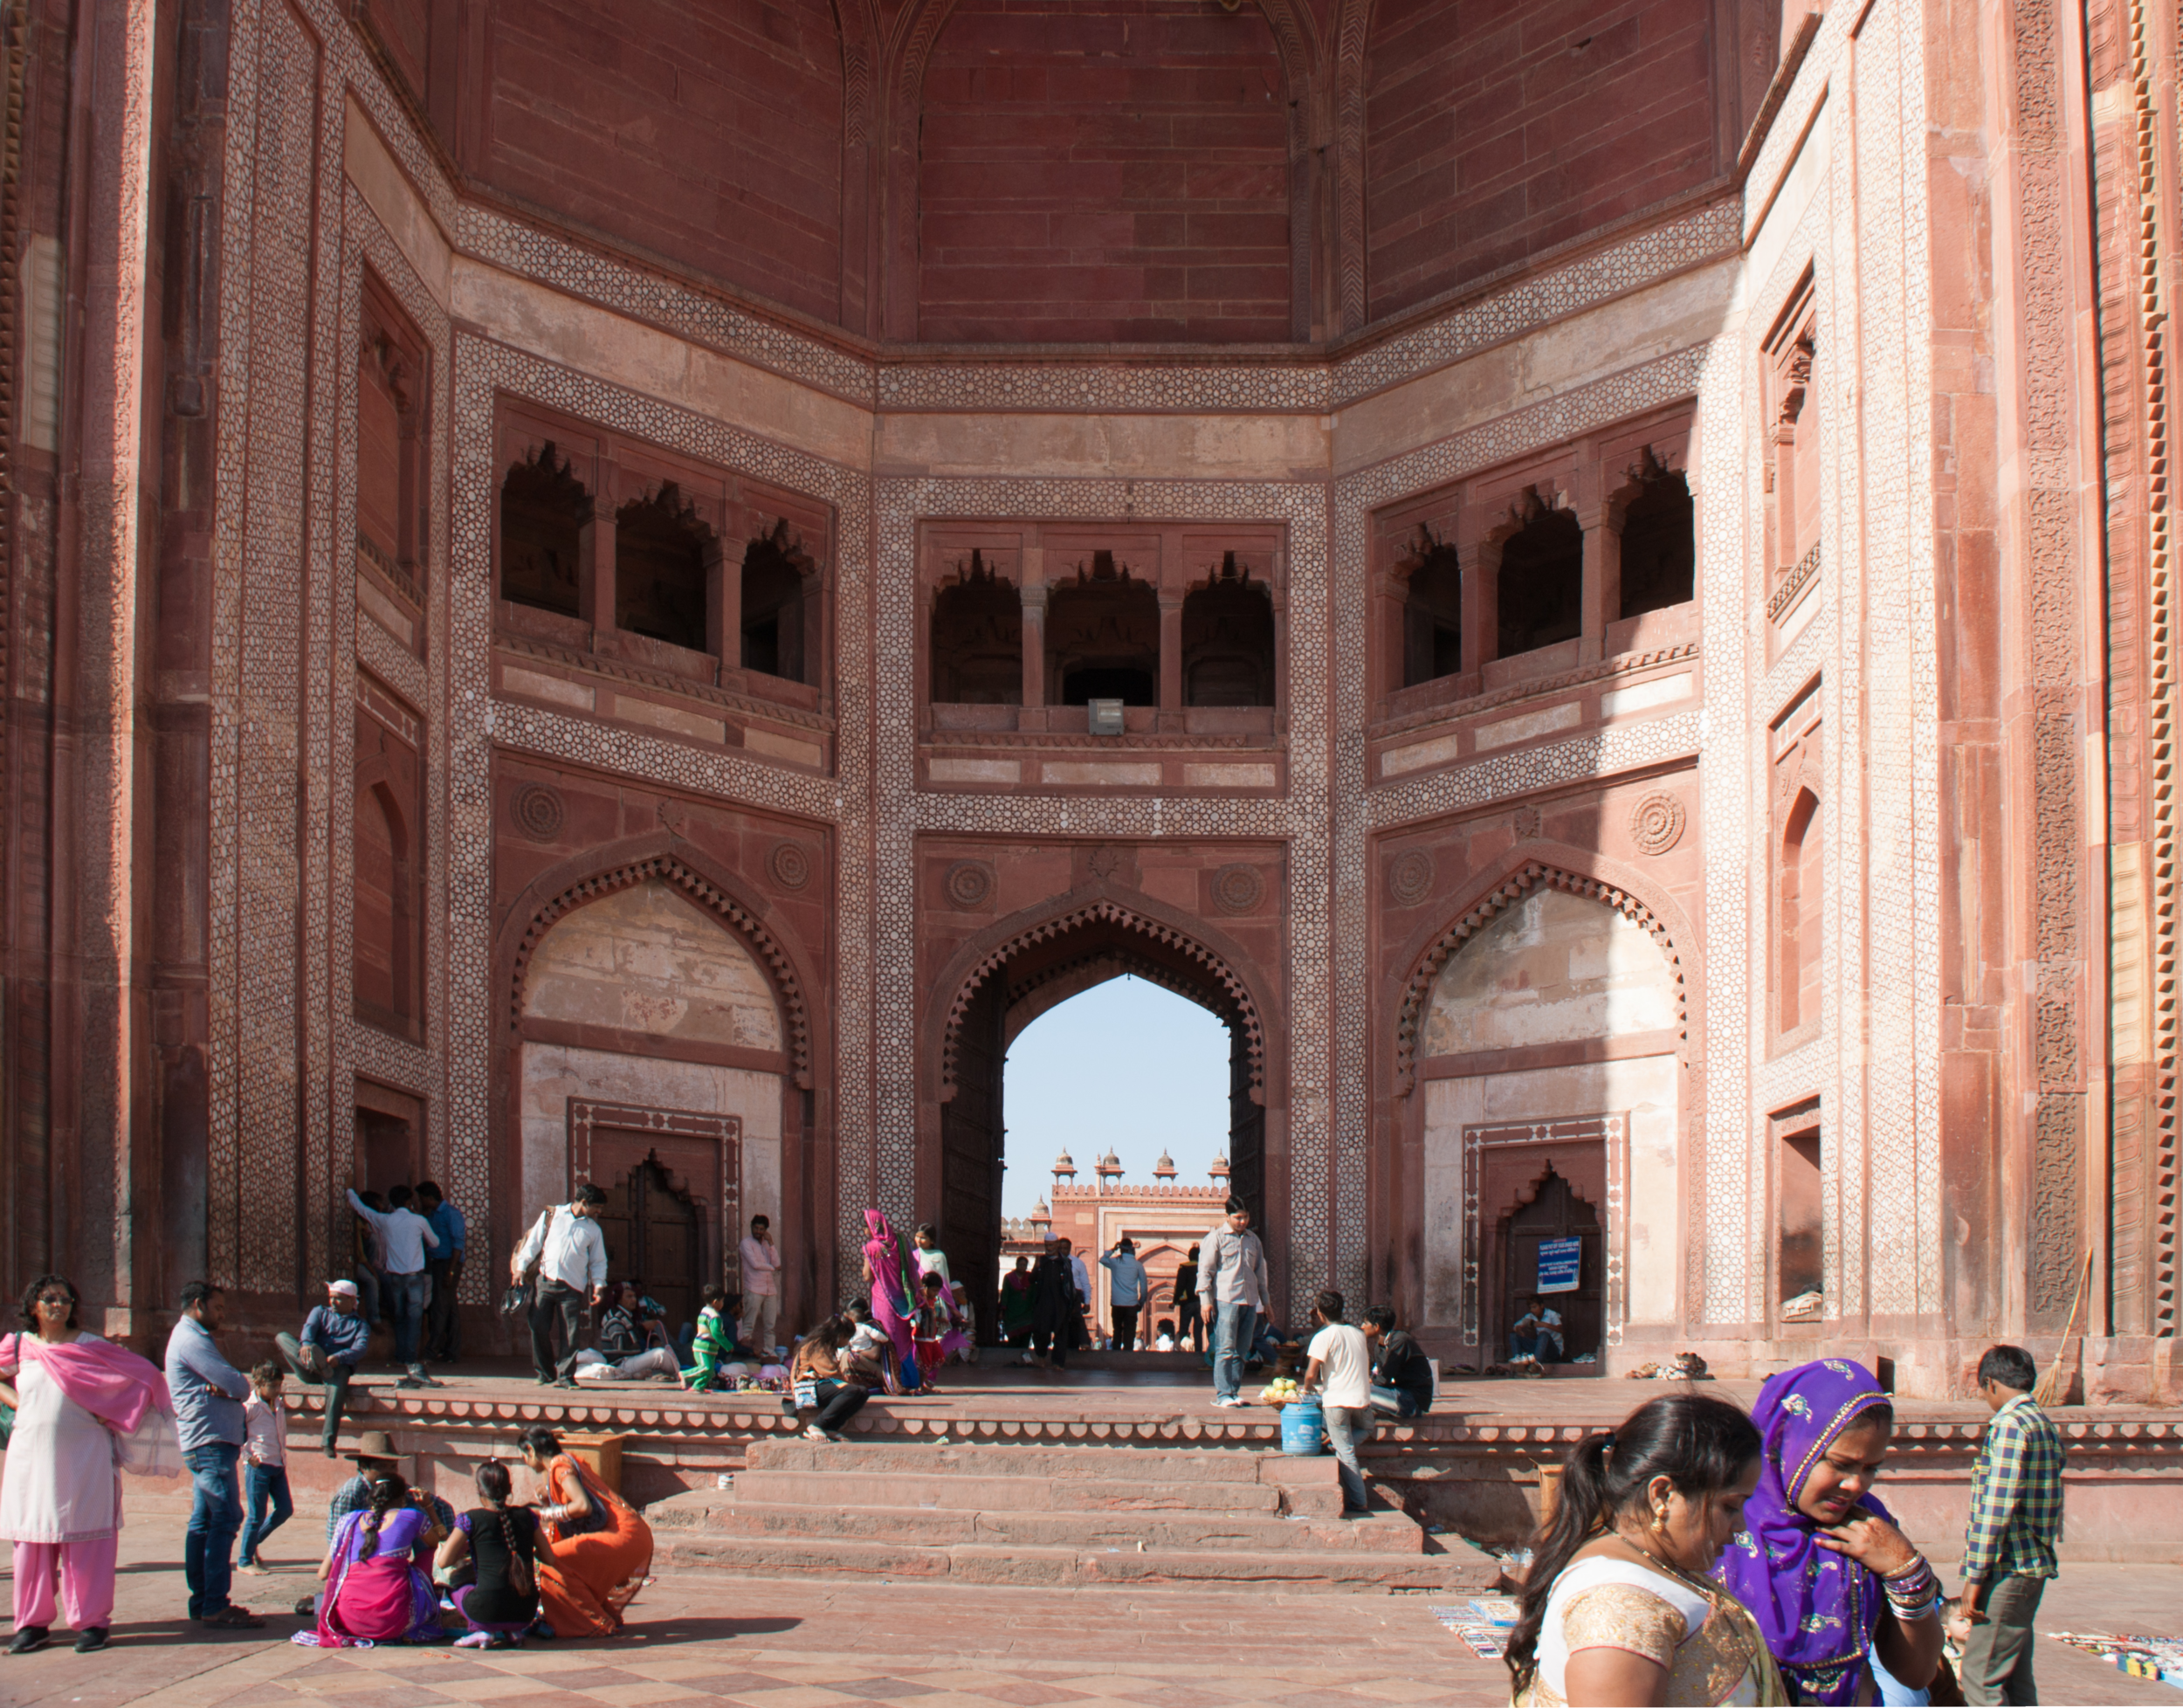 Gateways being used as spatial dividers at Fatehpur Sikri in Uttar Pradesh, India and the Taj Mahal in Agra, India.